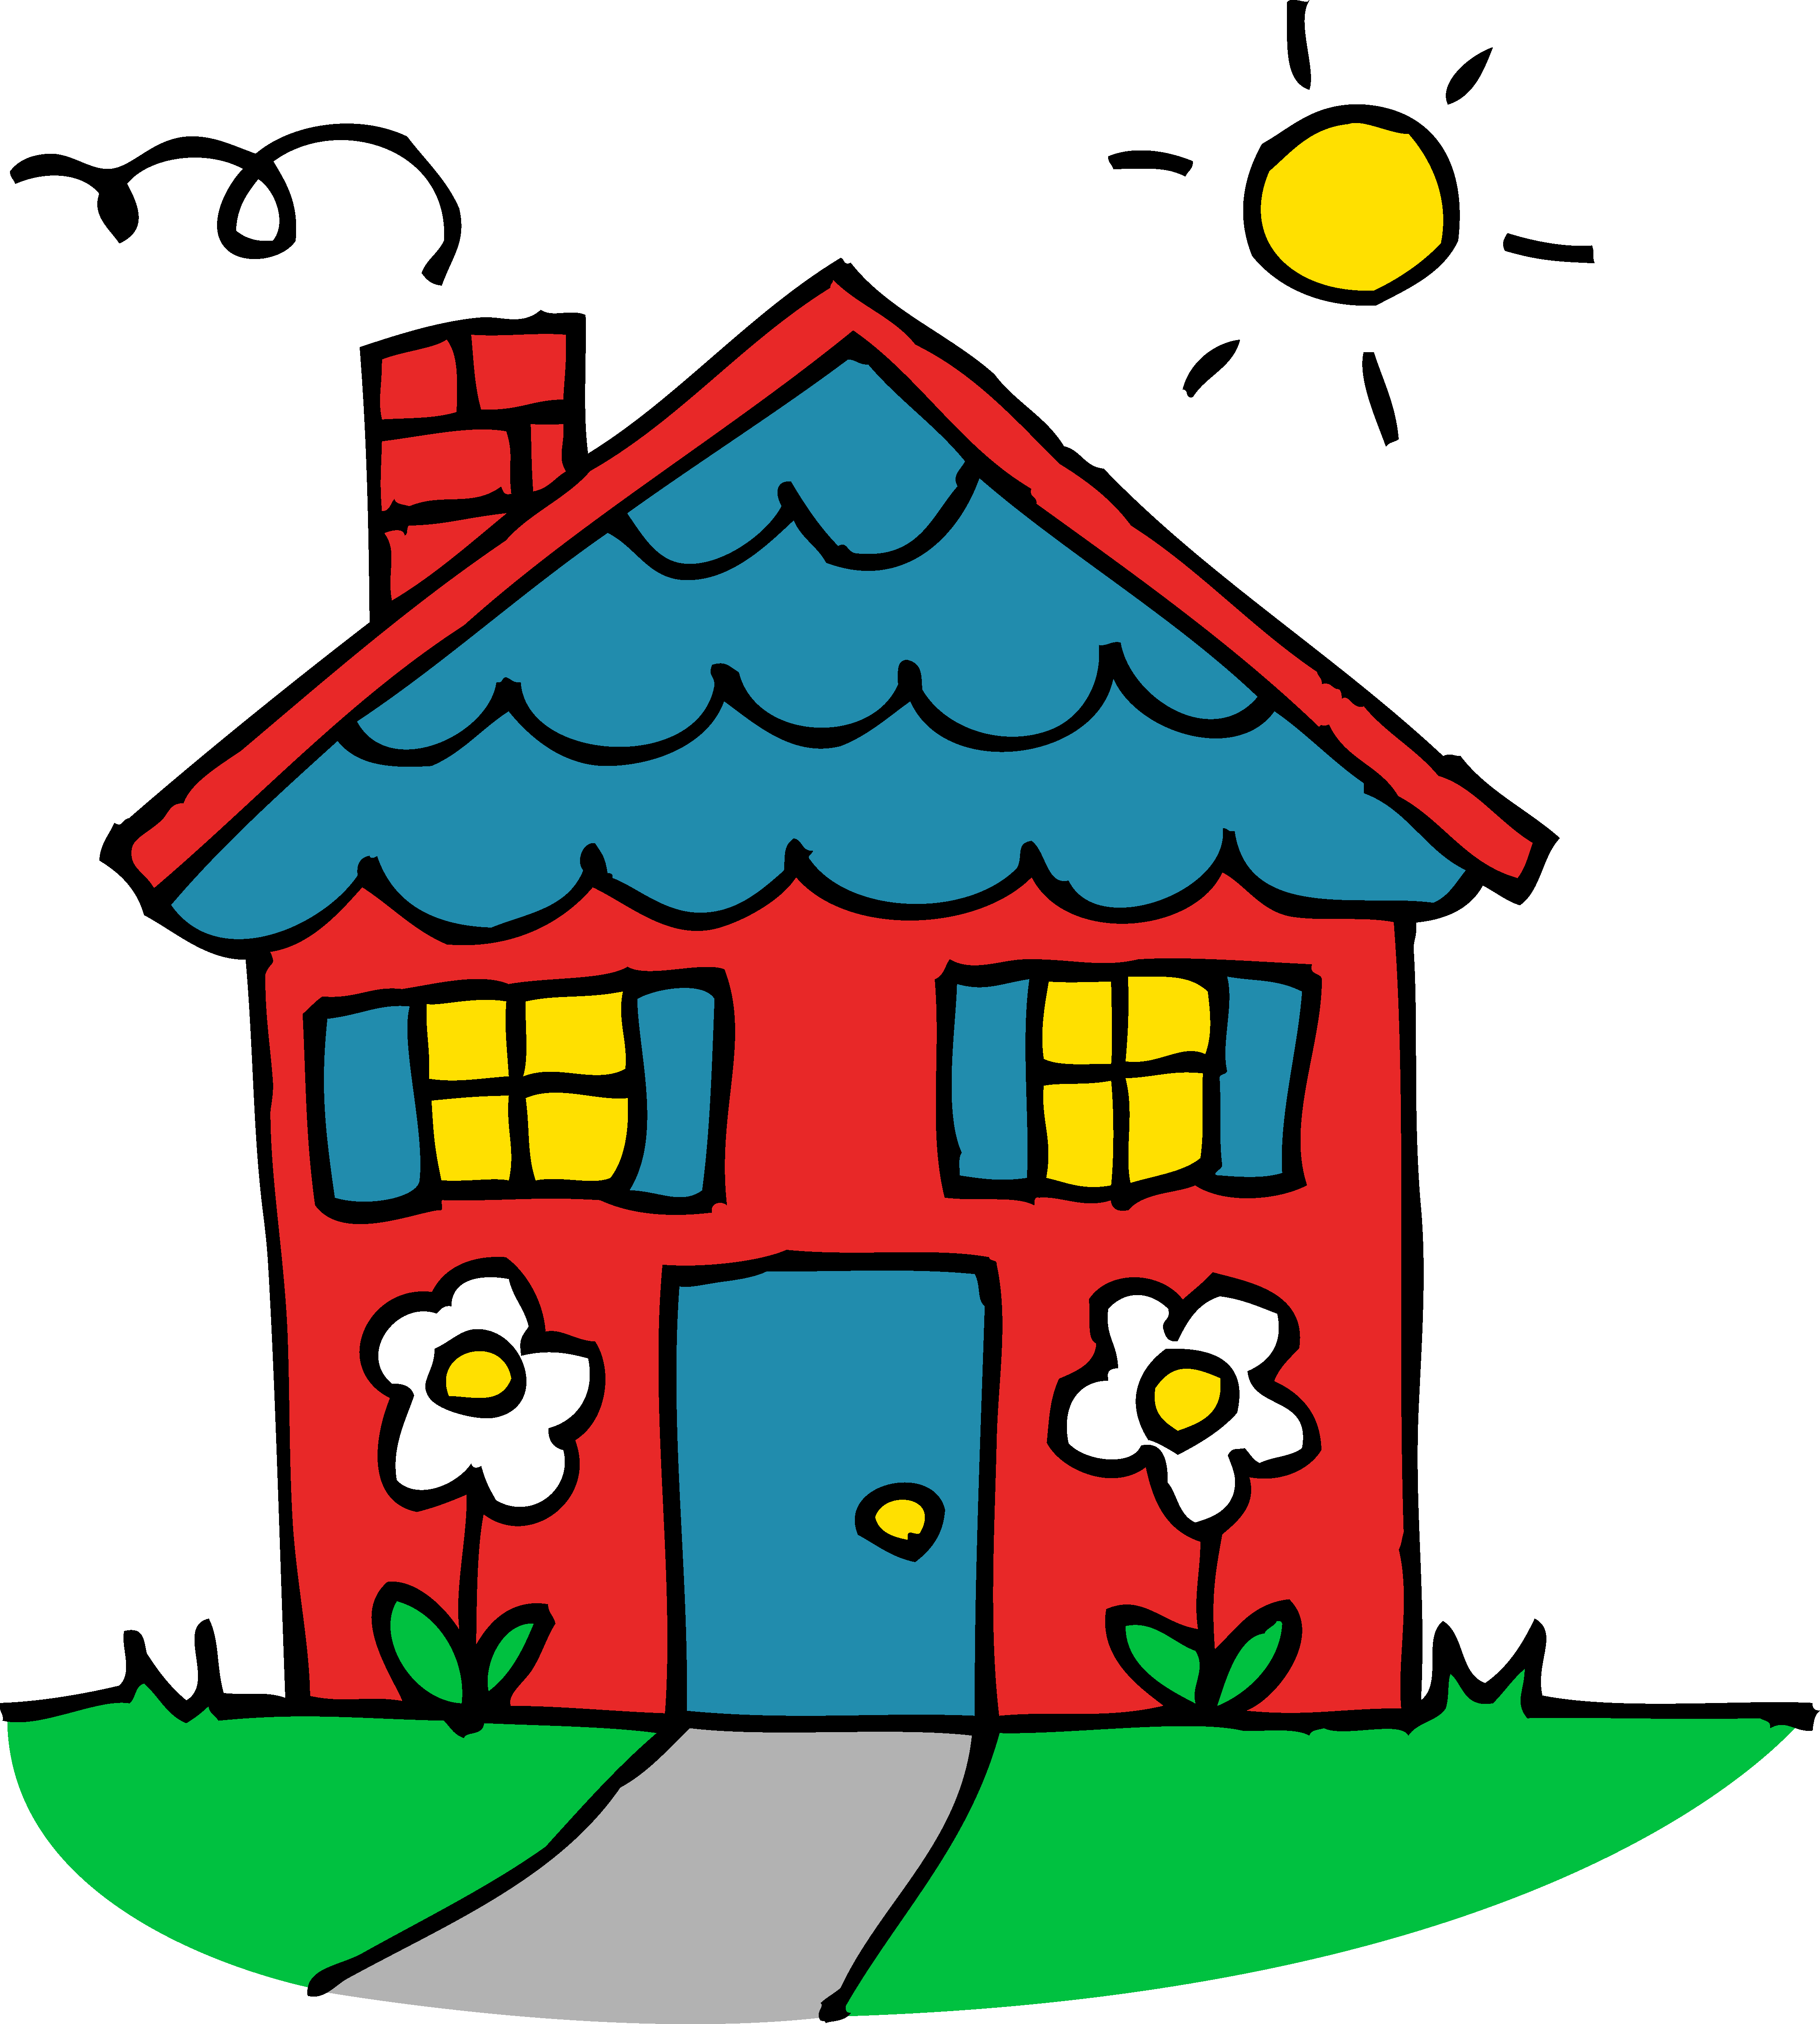 graphic Home sweet future blah. Neighborhood clipart duplex.